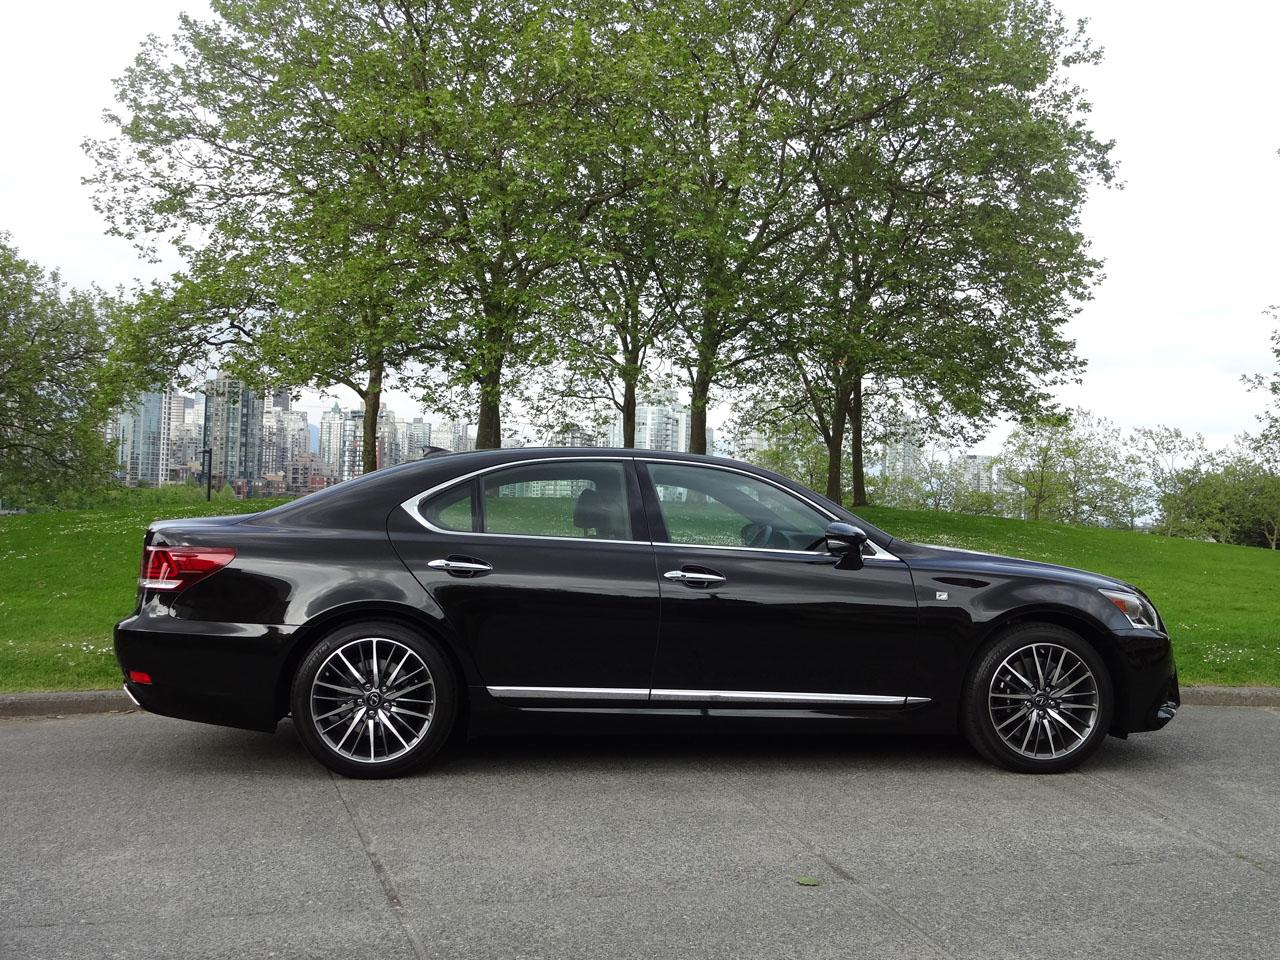 2014 lexus ls 460 f sport test drive luxury car video autos weblog. Black Bedroom Furniture Sets. Home Design Ideas